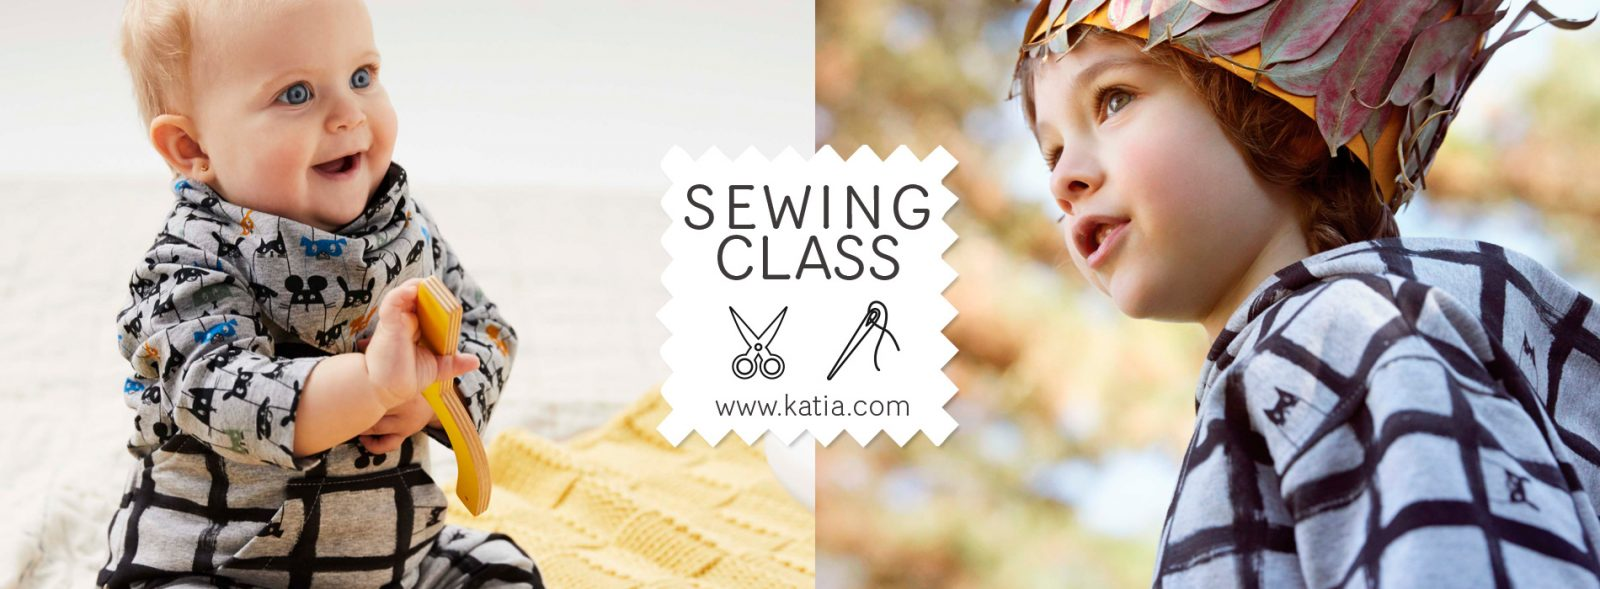 Sew cuffs and waistband